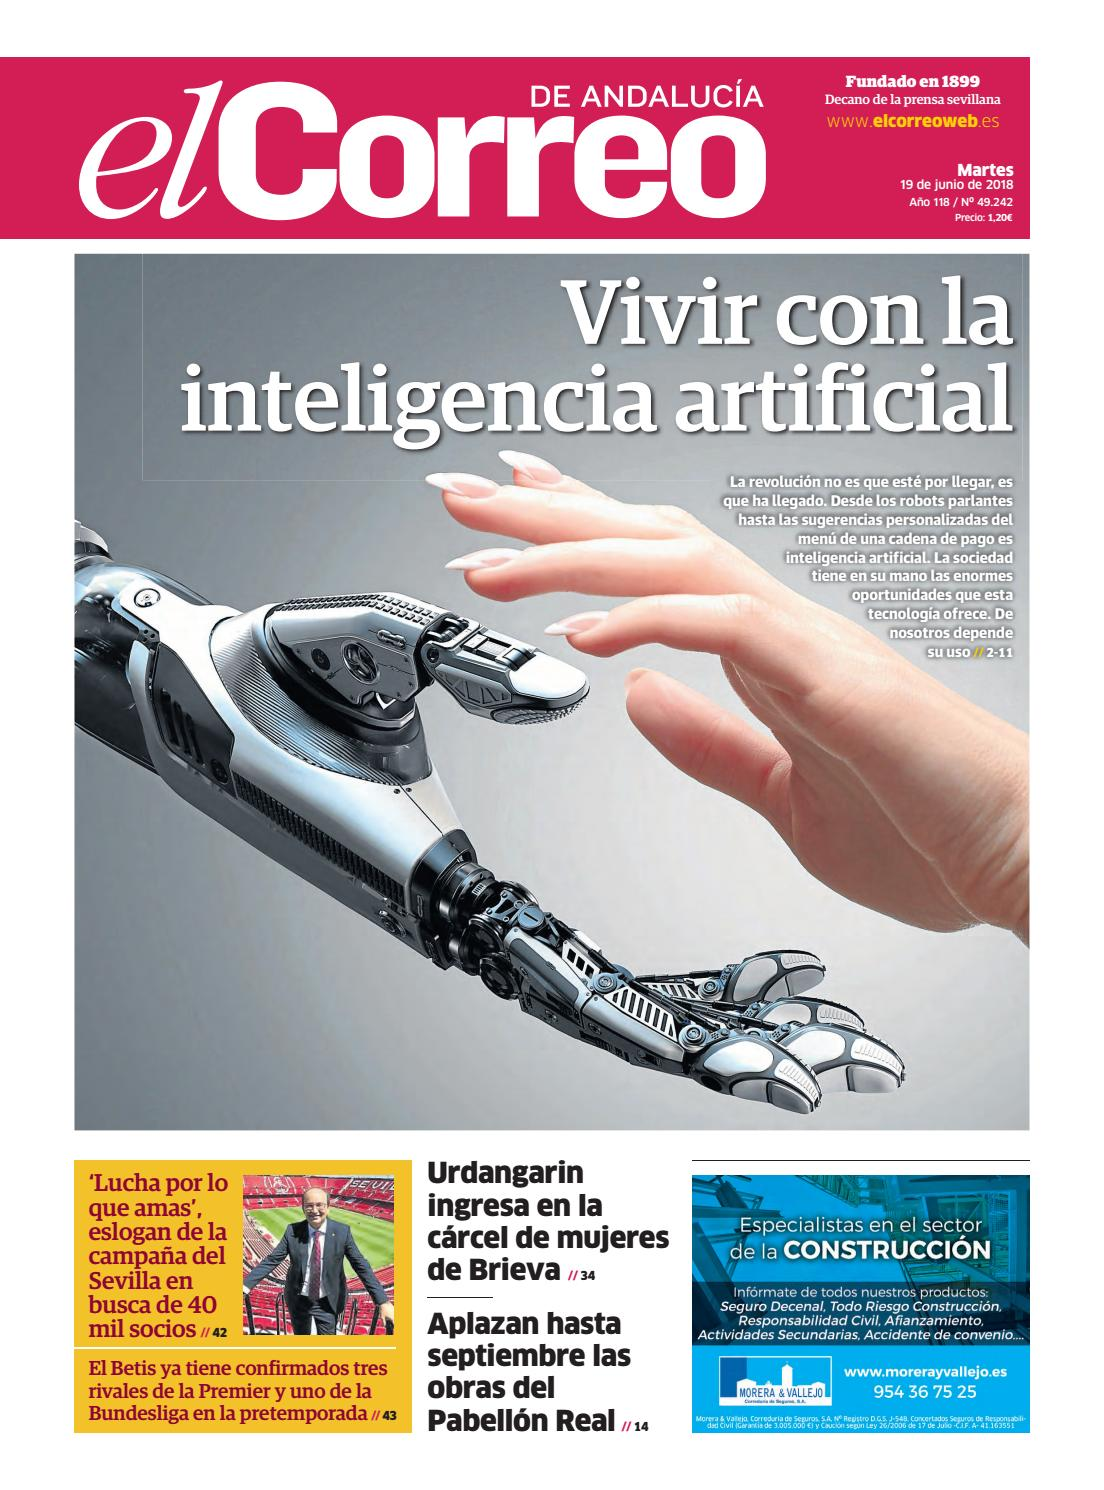 19.06.2018 El Correo de Andalucía by EL CORREO DE ANDALUCÍA S.L. - issuu f6a6bfa44c38